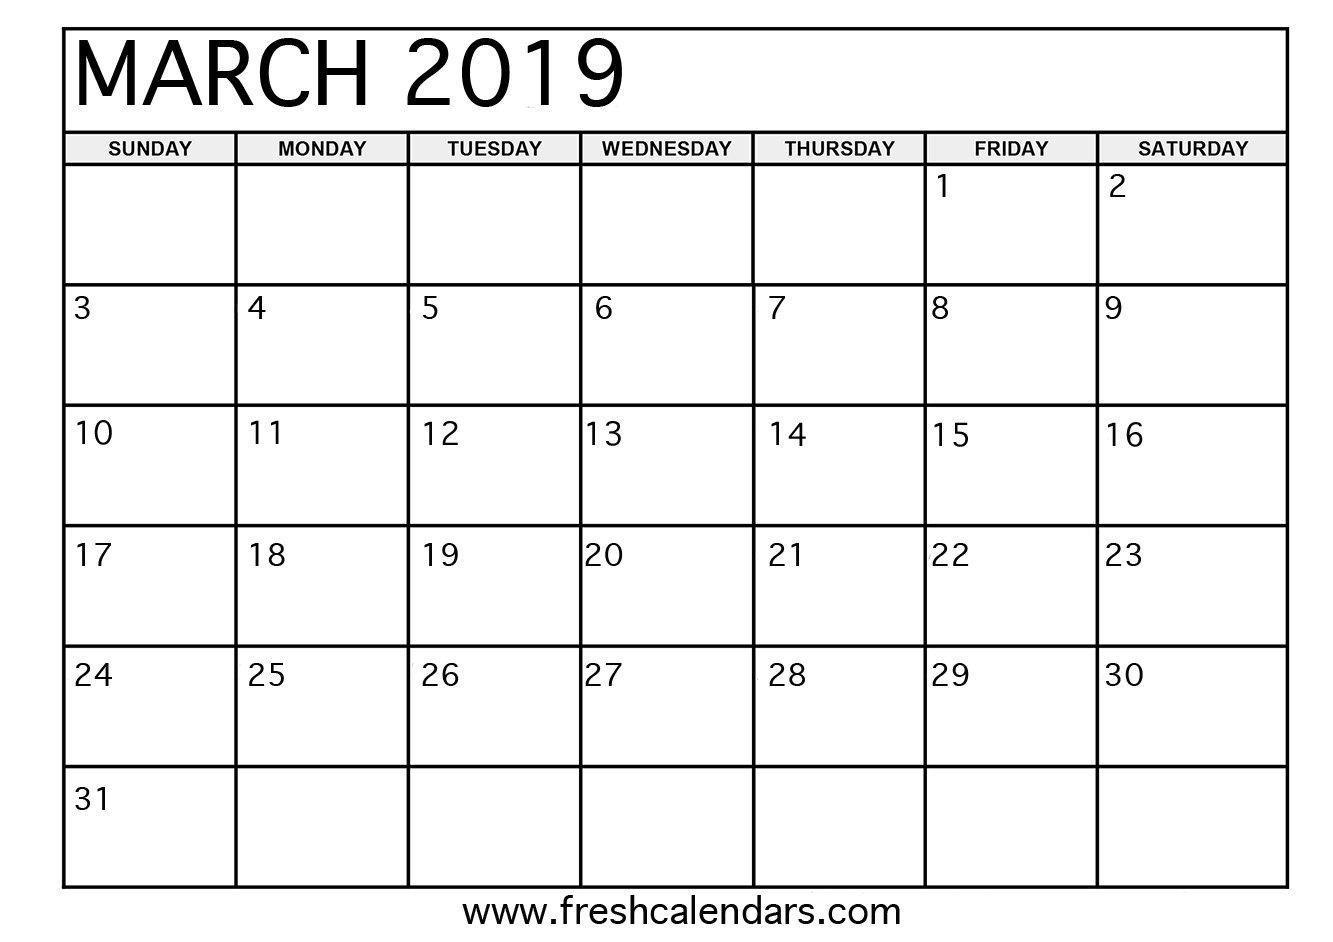 March 2019 Printable Calendars - Fresh Calendars March 7 2019 Calendar